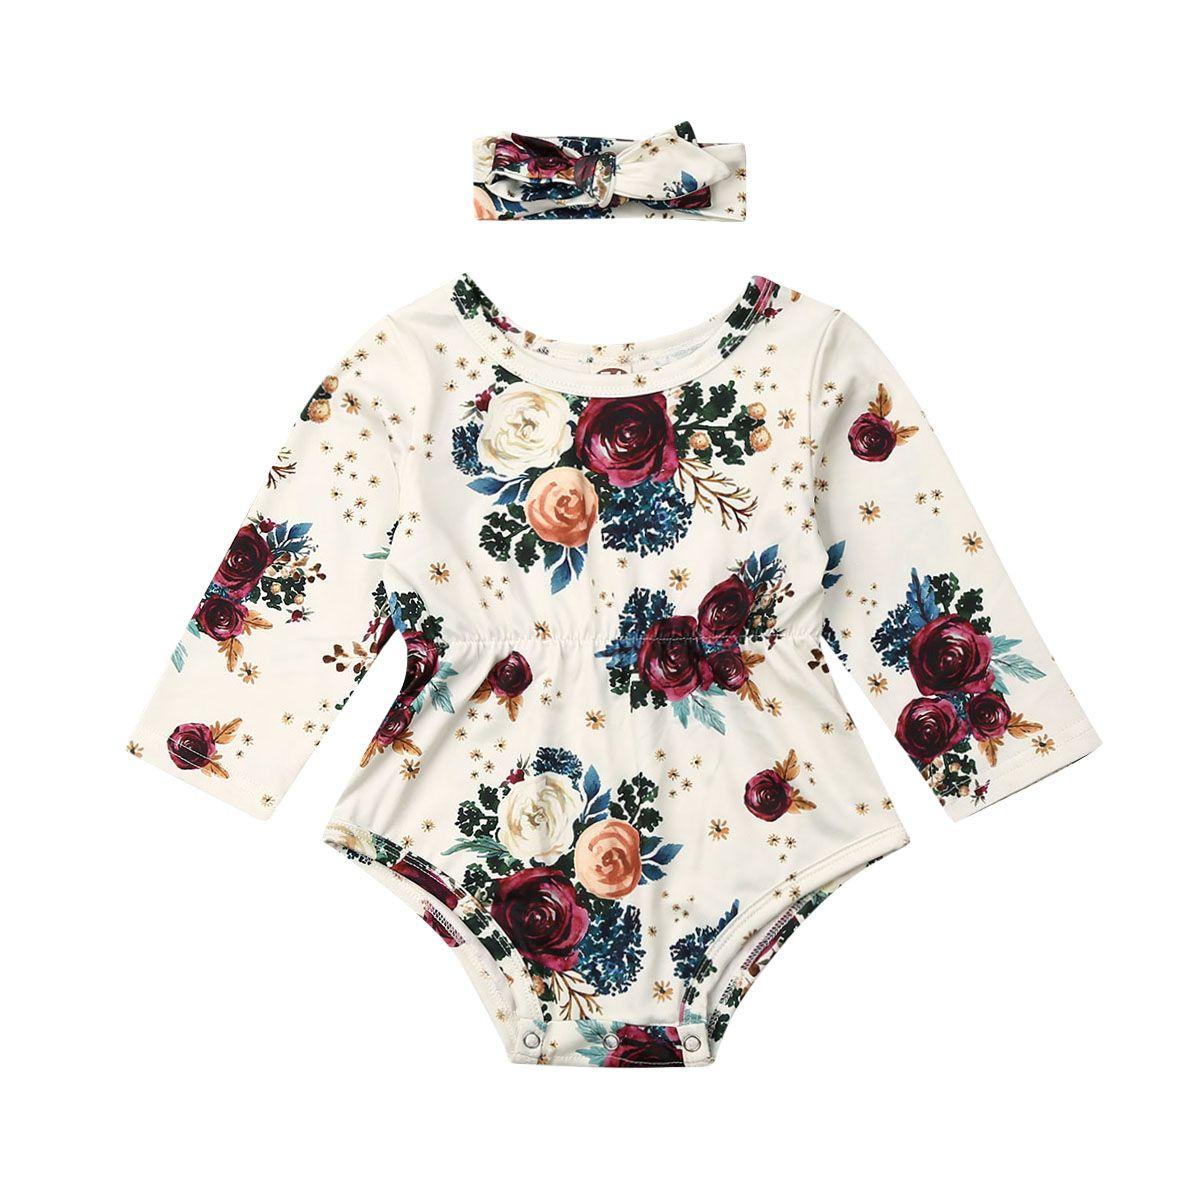 Newborn Infant Baby Girls Outfit Clothes Romper Jumpsuit Bodysuit Dress Headband